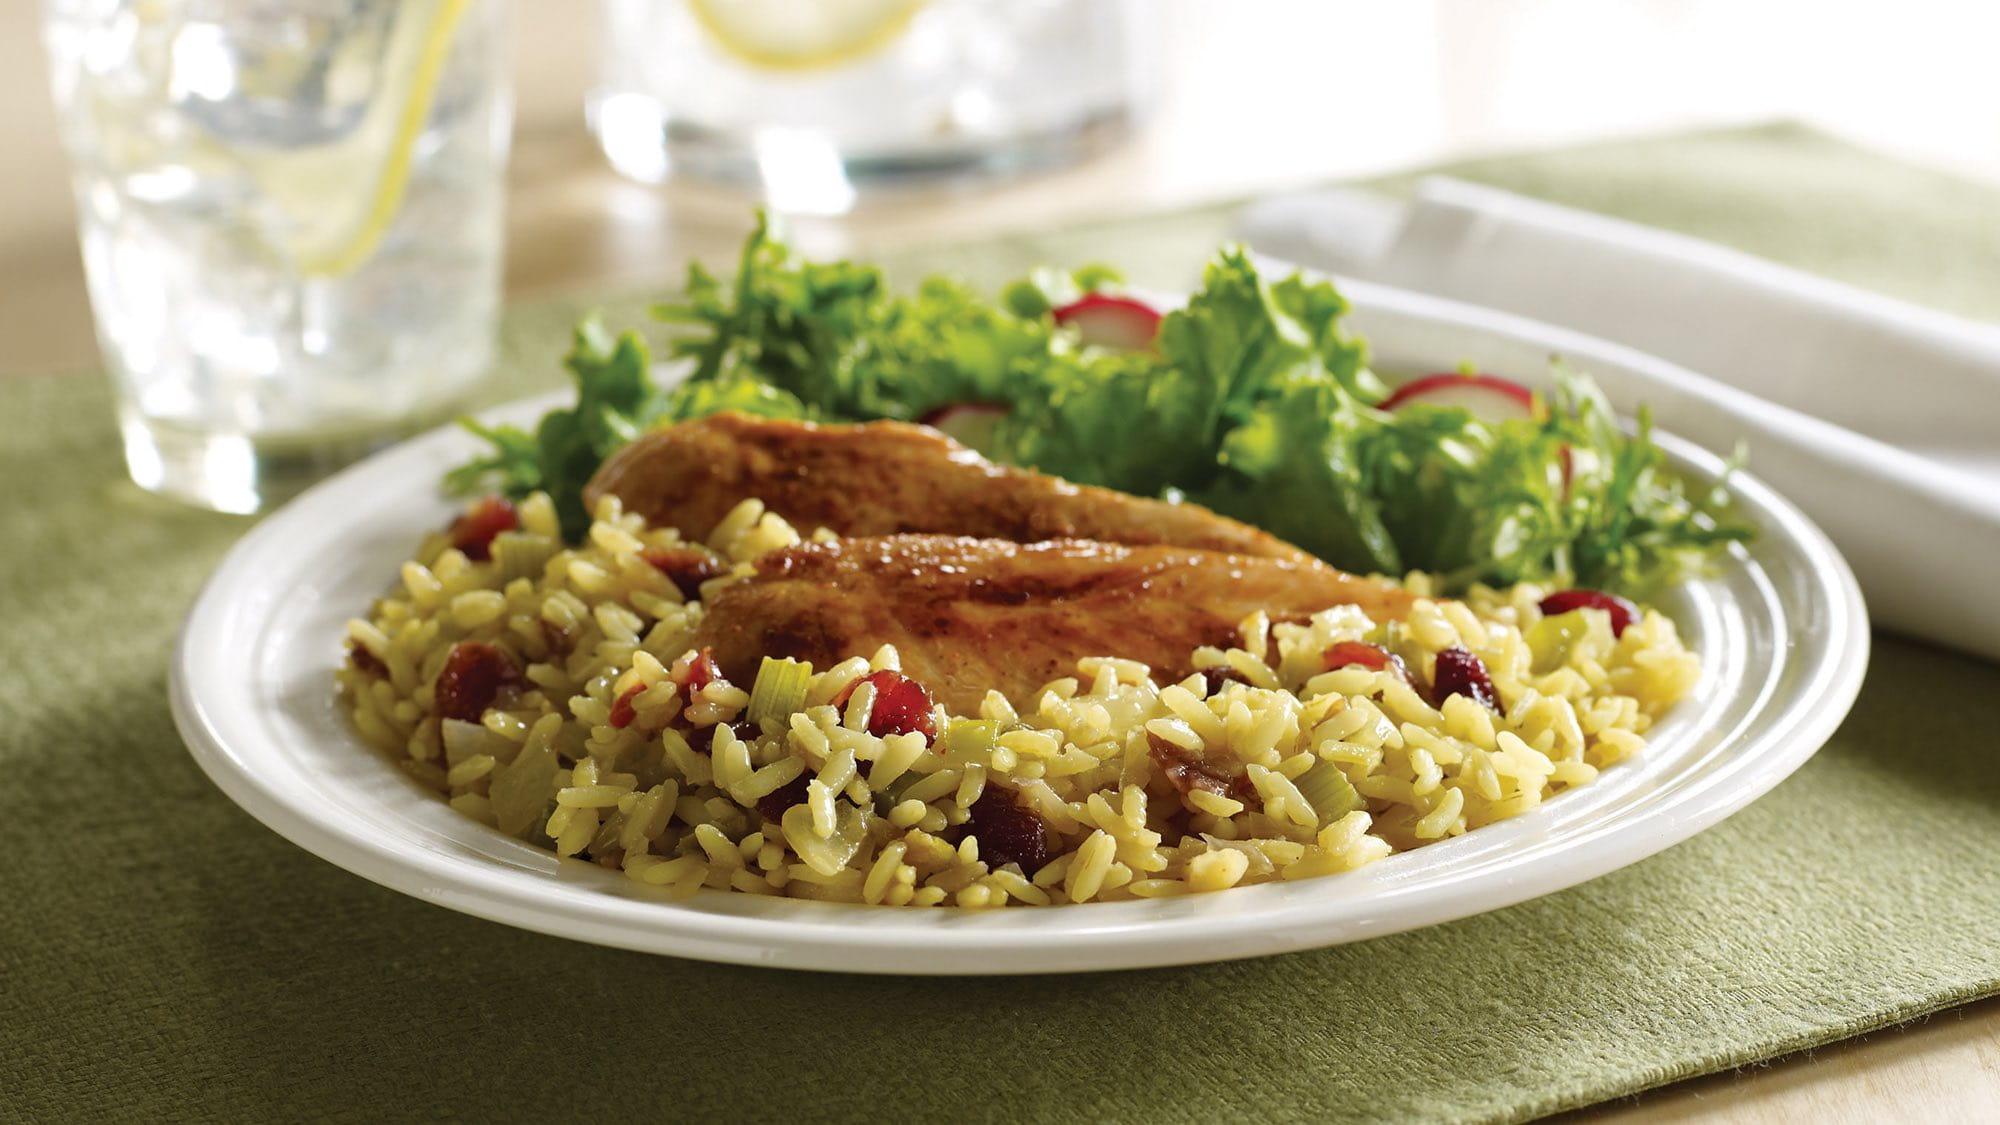 gluten-free-yellow-rice-with-cranberries.jpg